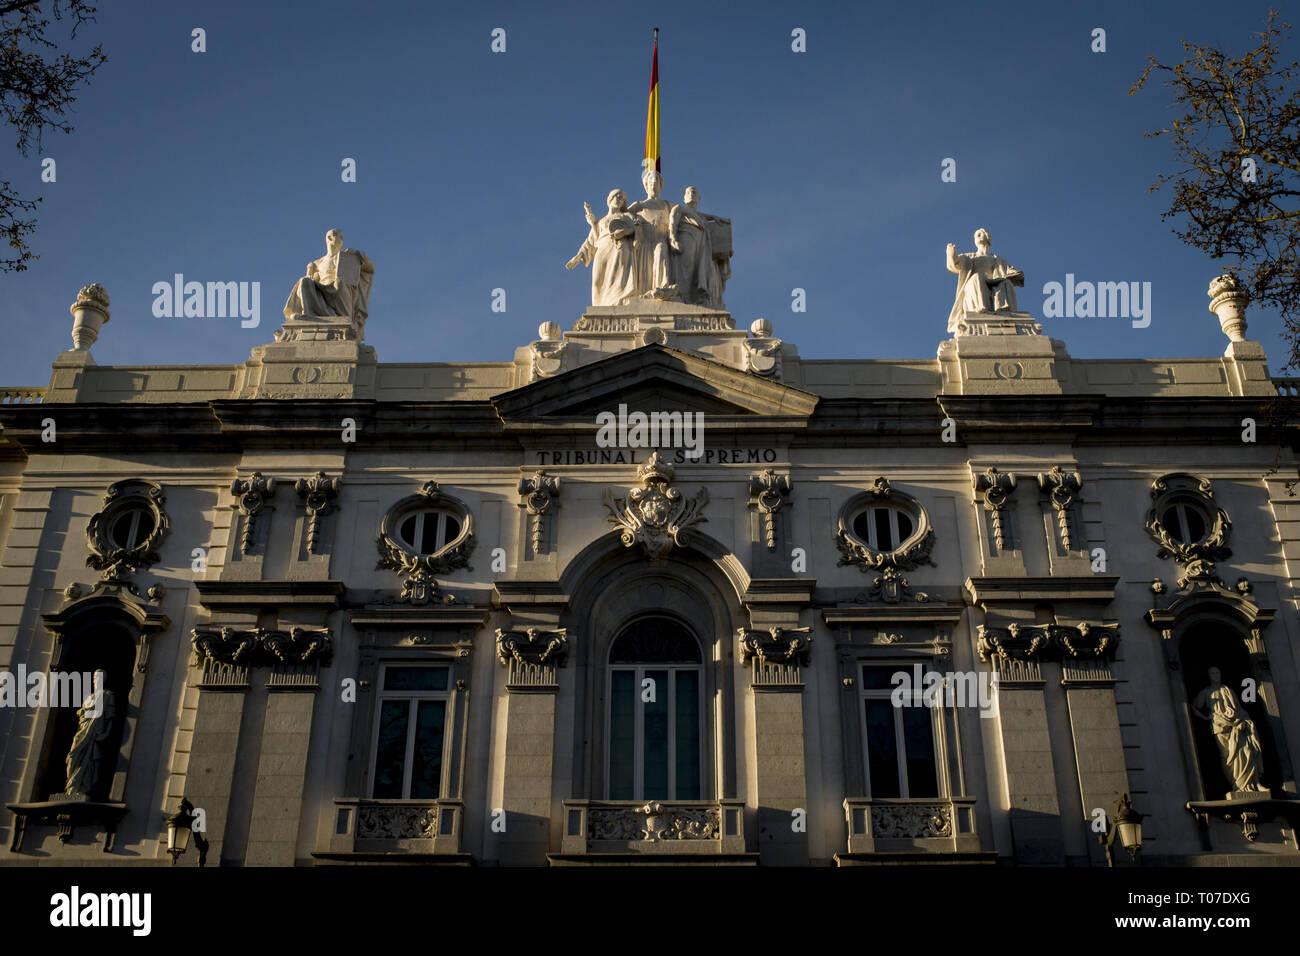 Madrid, Spain  16th Mar, 2019  Spanish Supreme Court building